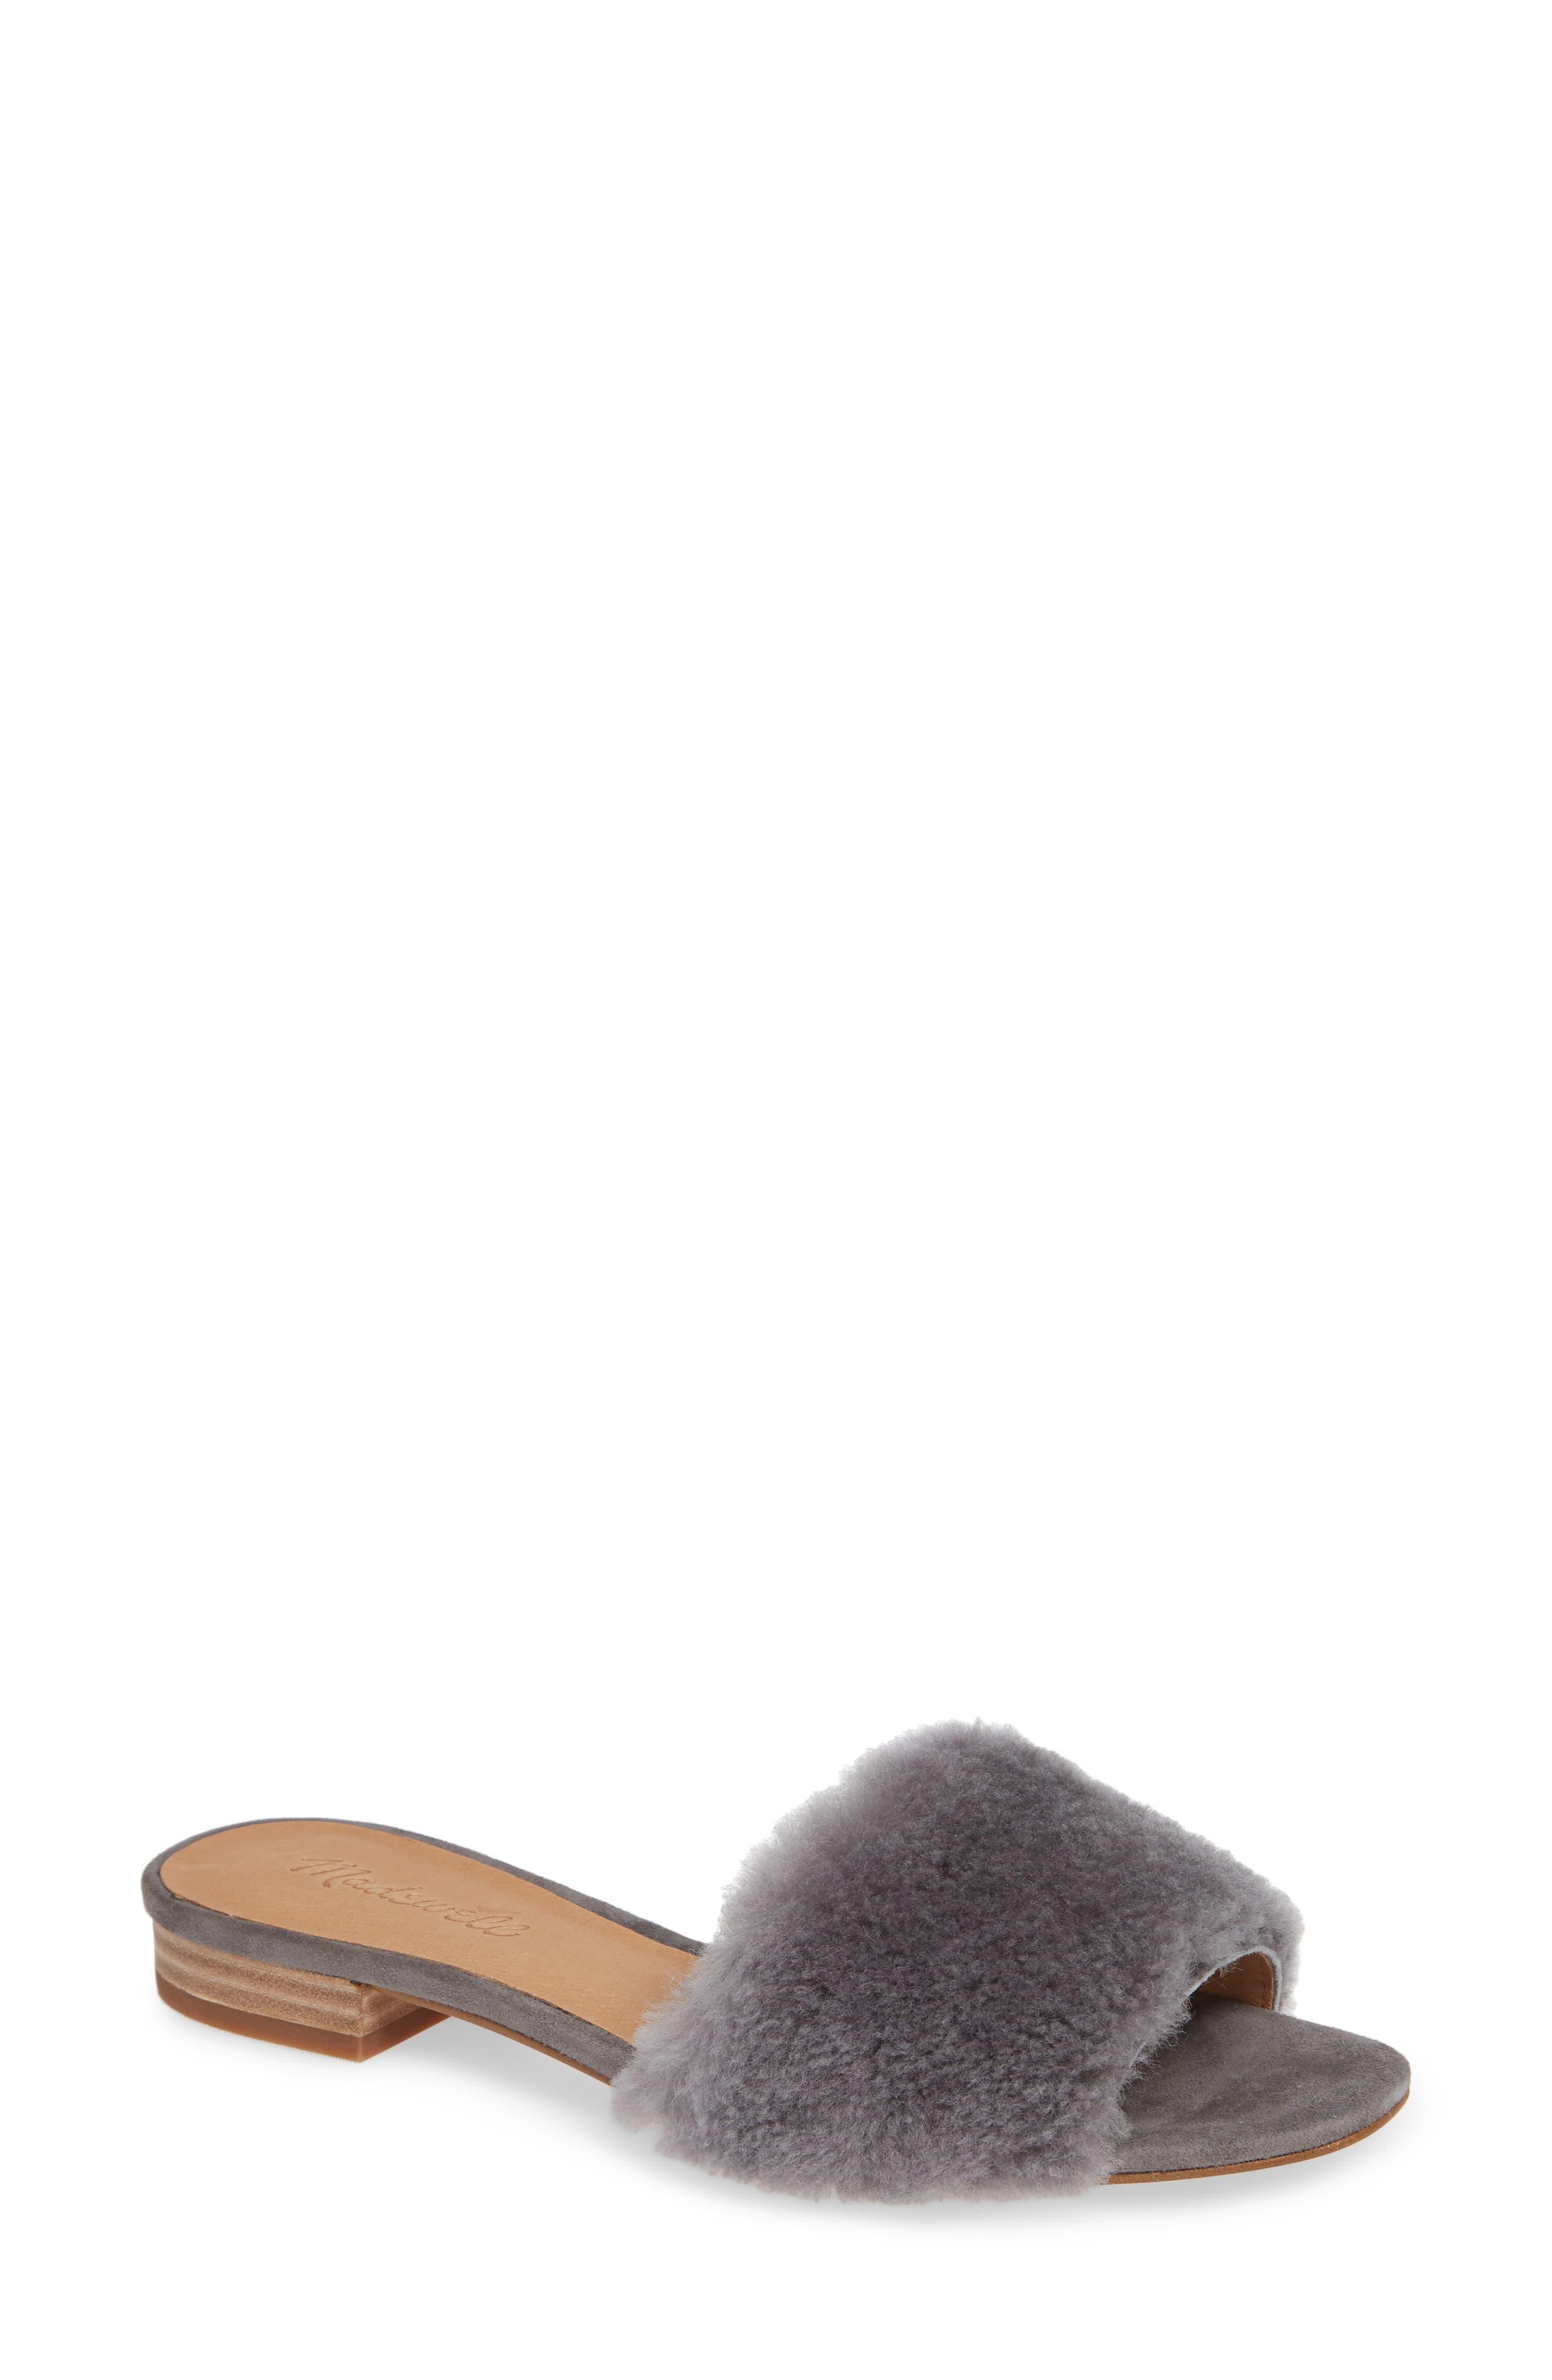 Madewell Jackson Genuine Shearling Slide Sandal, Grey